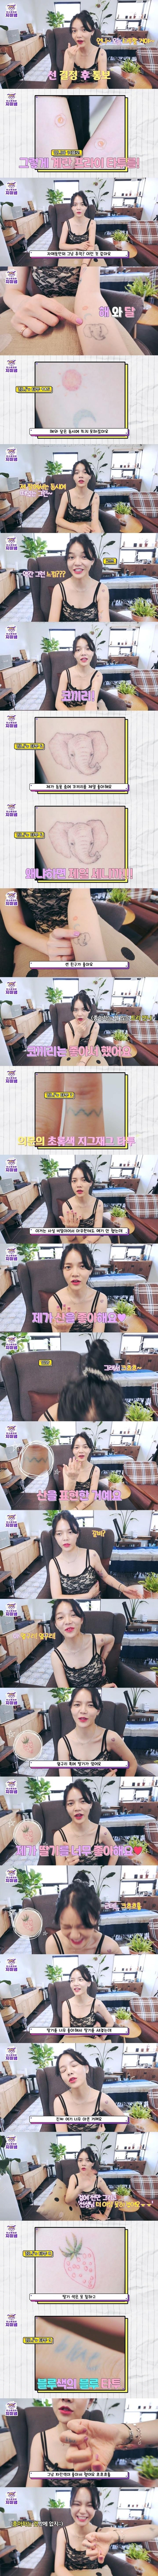 AOA 지민 34개 타투 공개